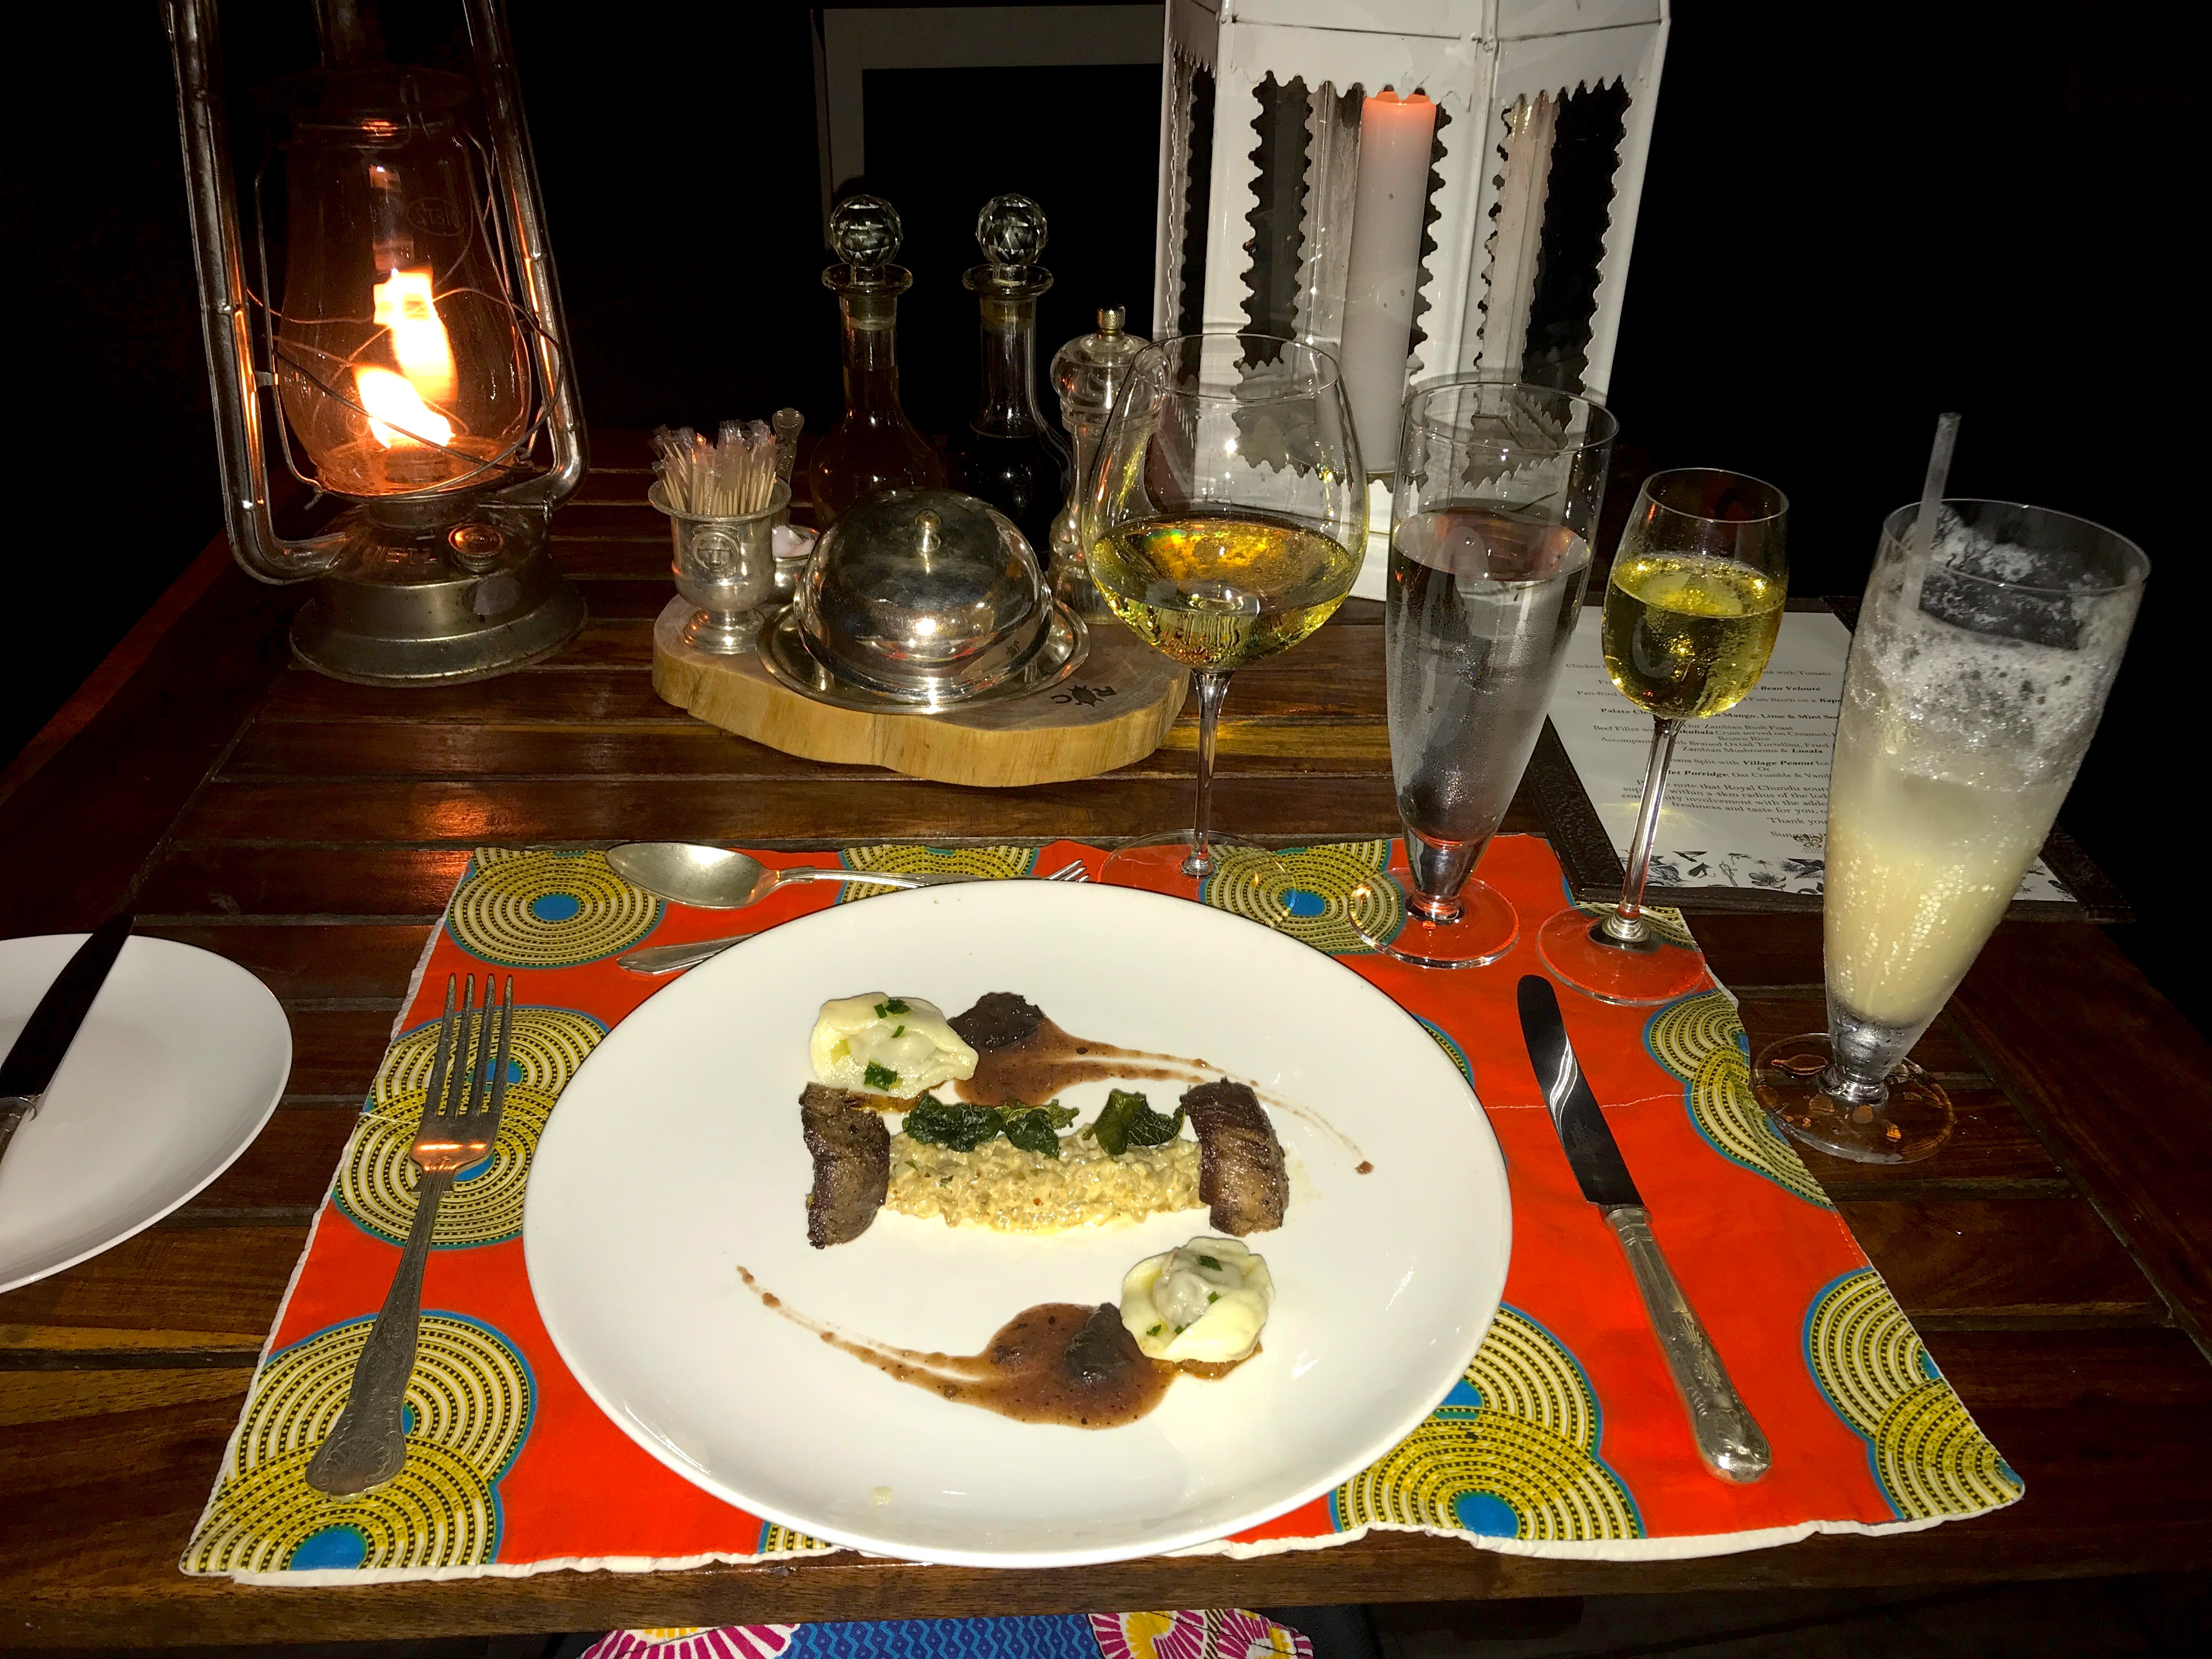 zambian-soup-royalchundu-lustforthesublime